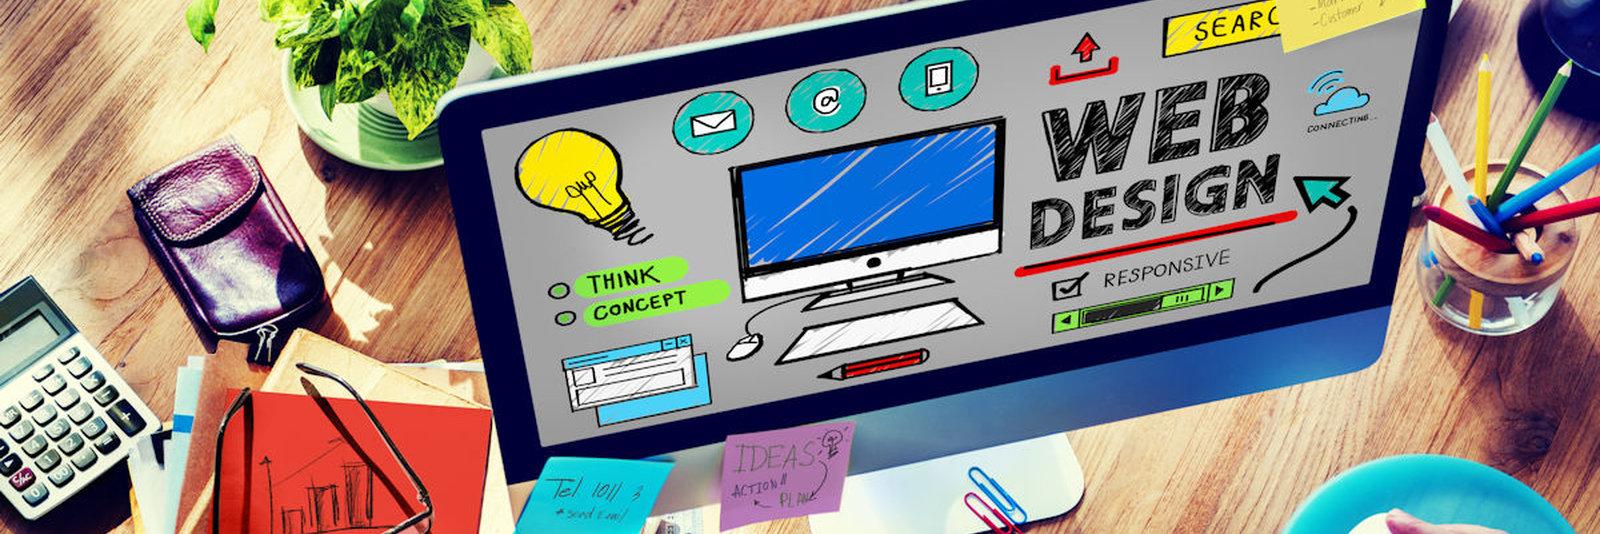 Pagesonly.com Web Design